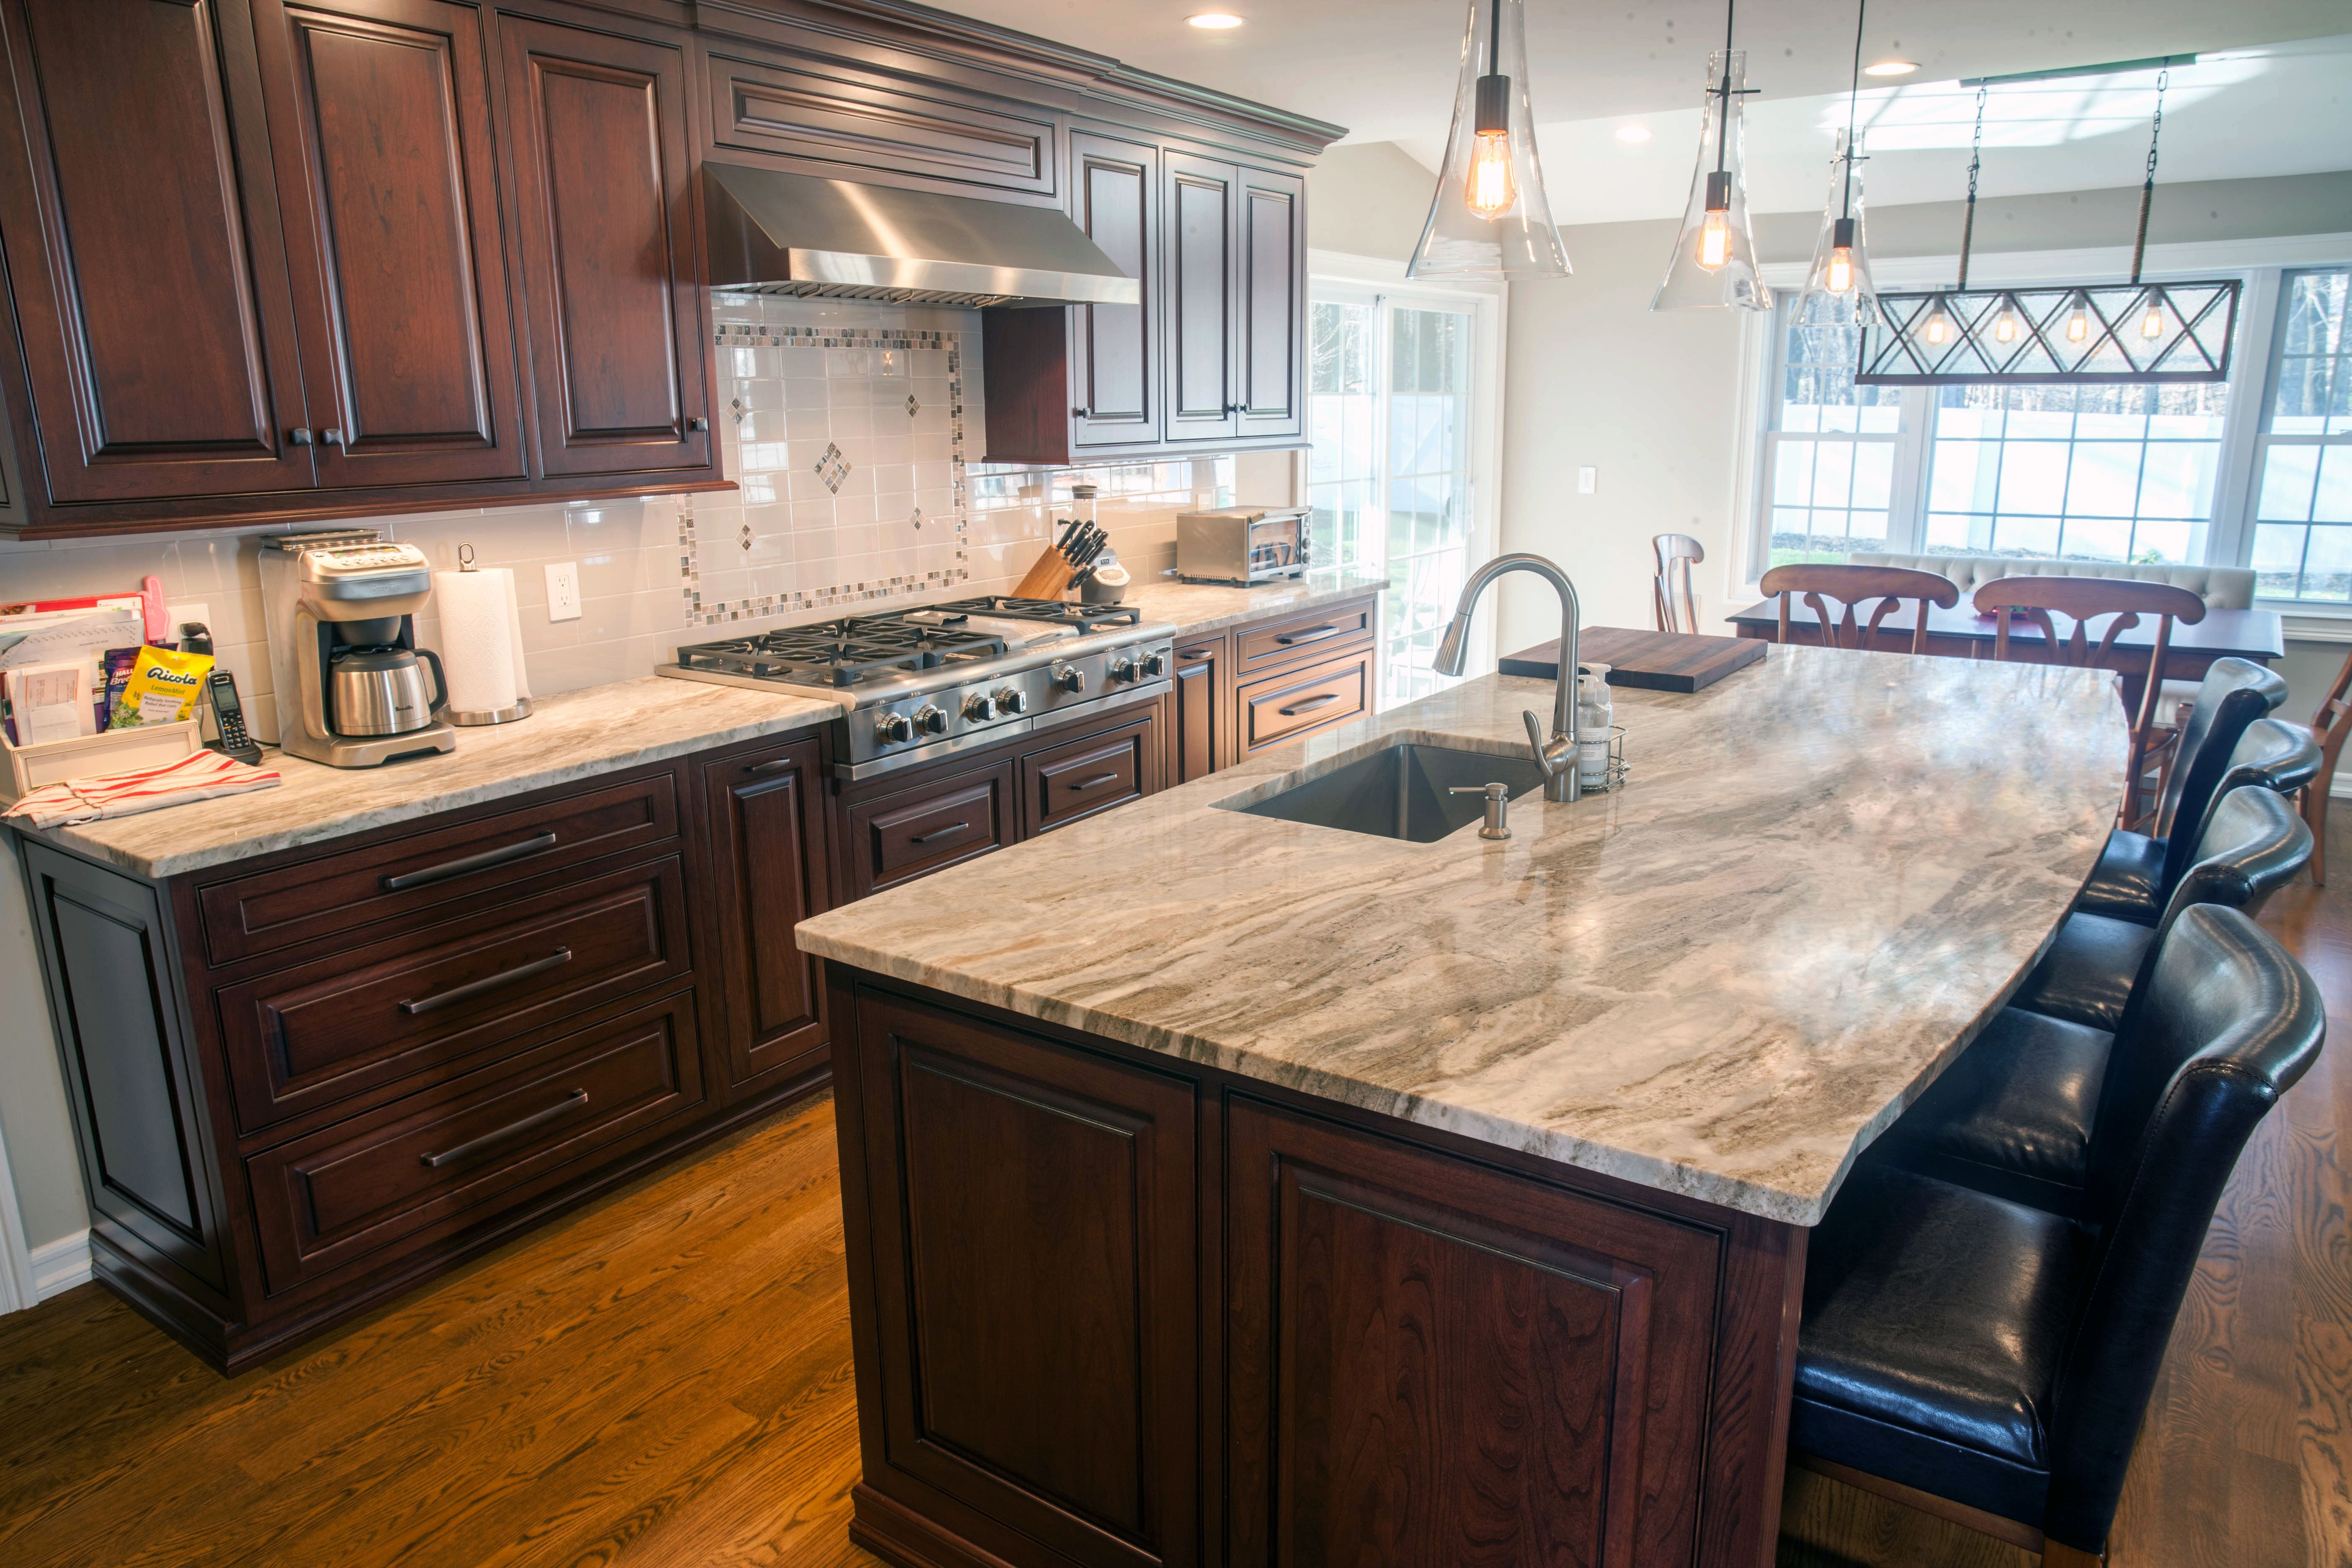 An Open Kitchen Design Is A Great Way To Ensure A Well Lit Space For Cooking And Entertaining Cocinas Espacios Pequenos Espacio